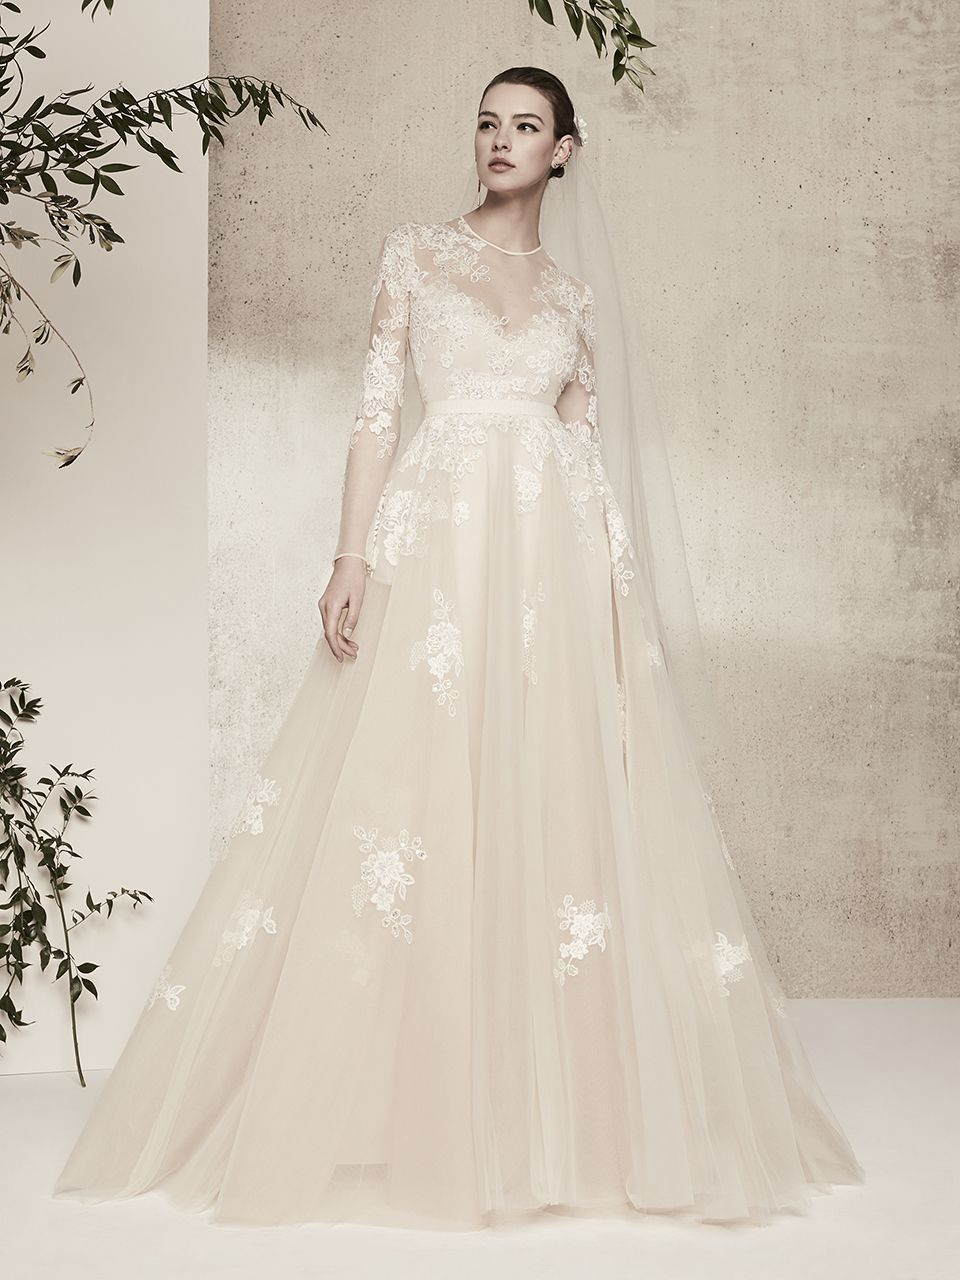 ELIE SAAB Bridal   Spring 2018   Love-Nuptuals   Pinterest   Elie ...